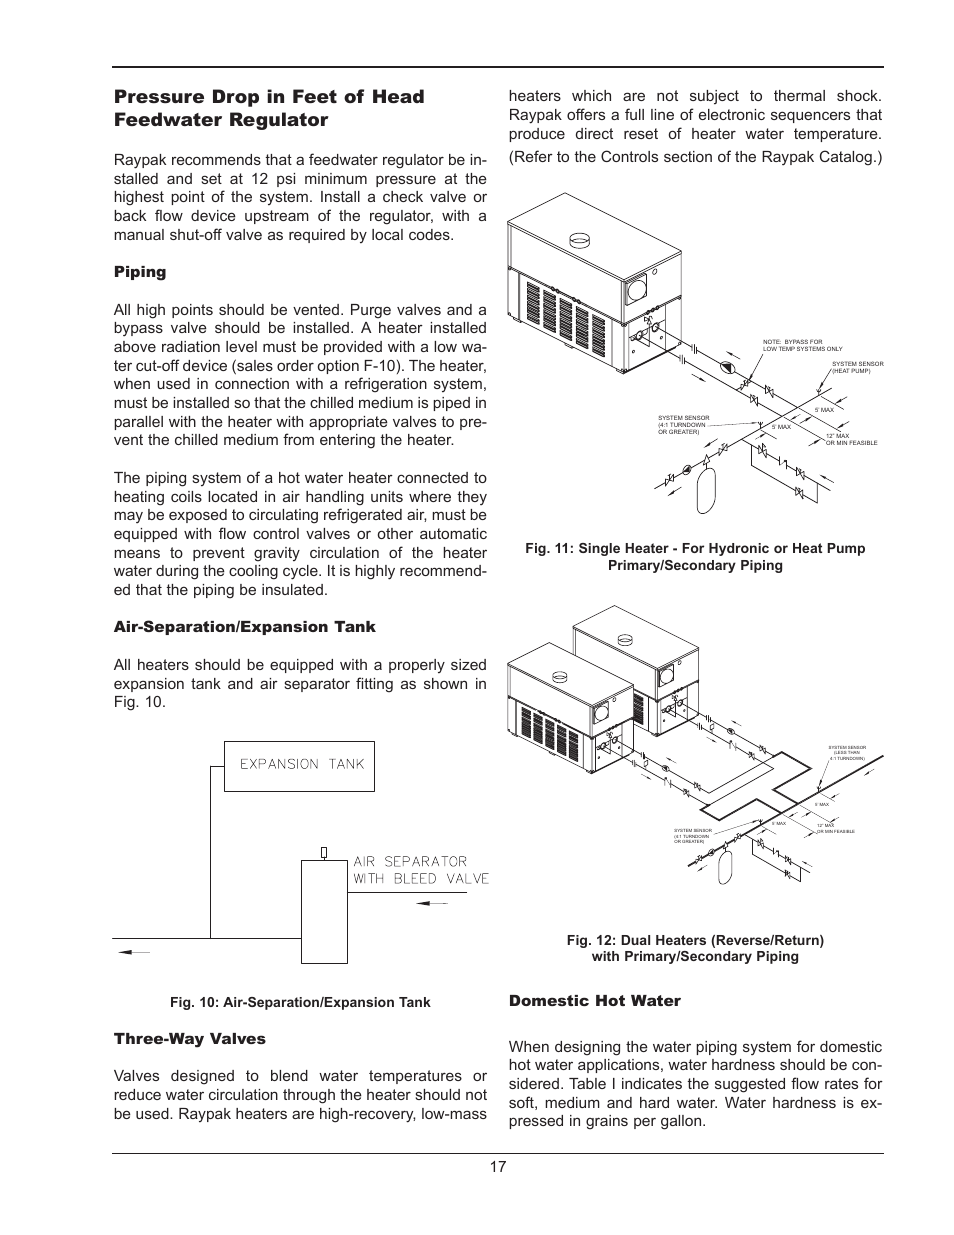 medium resolution of pressure drop in feet of head feedwater regulator fig 10 air separation expansion tank raypak hi delta 302b user manual page 17 60